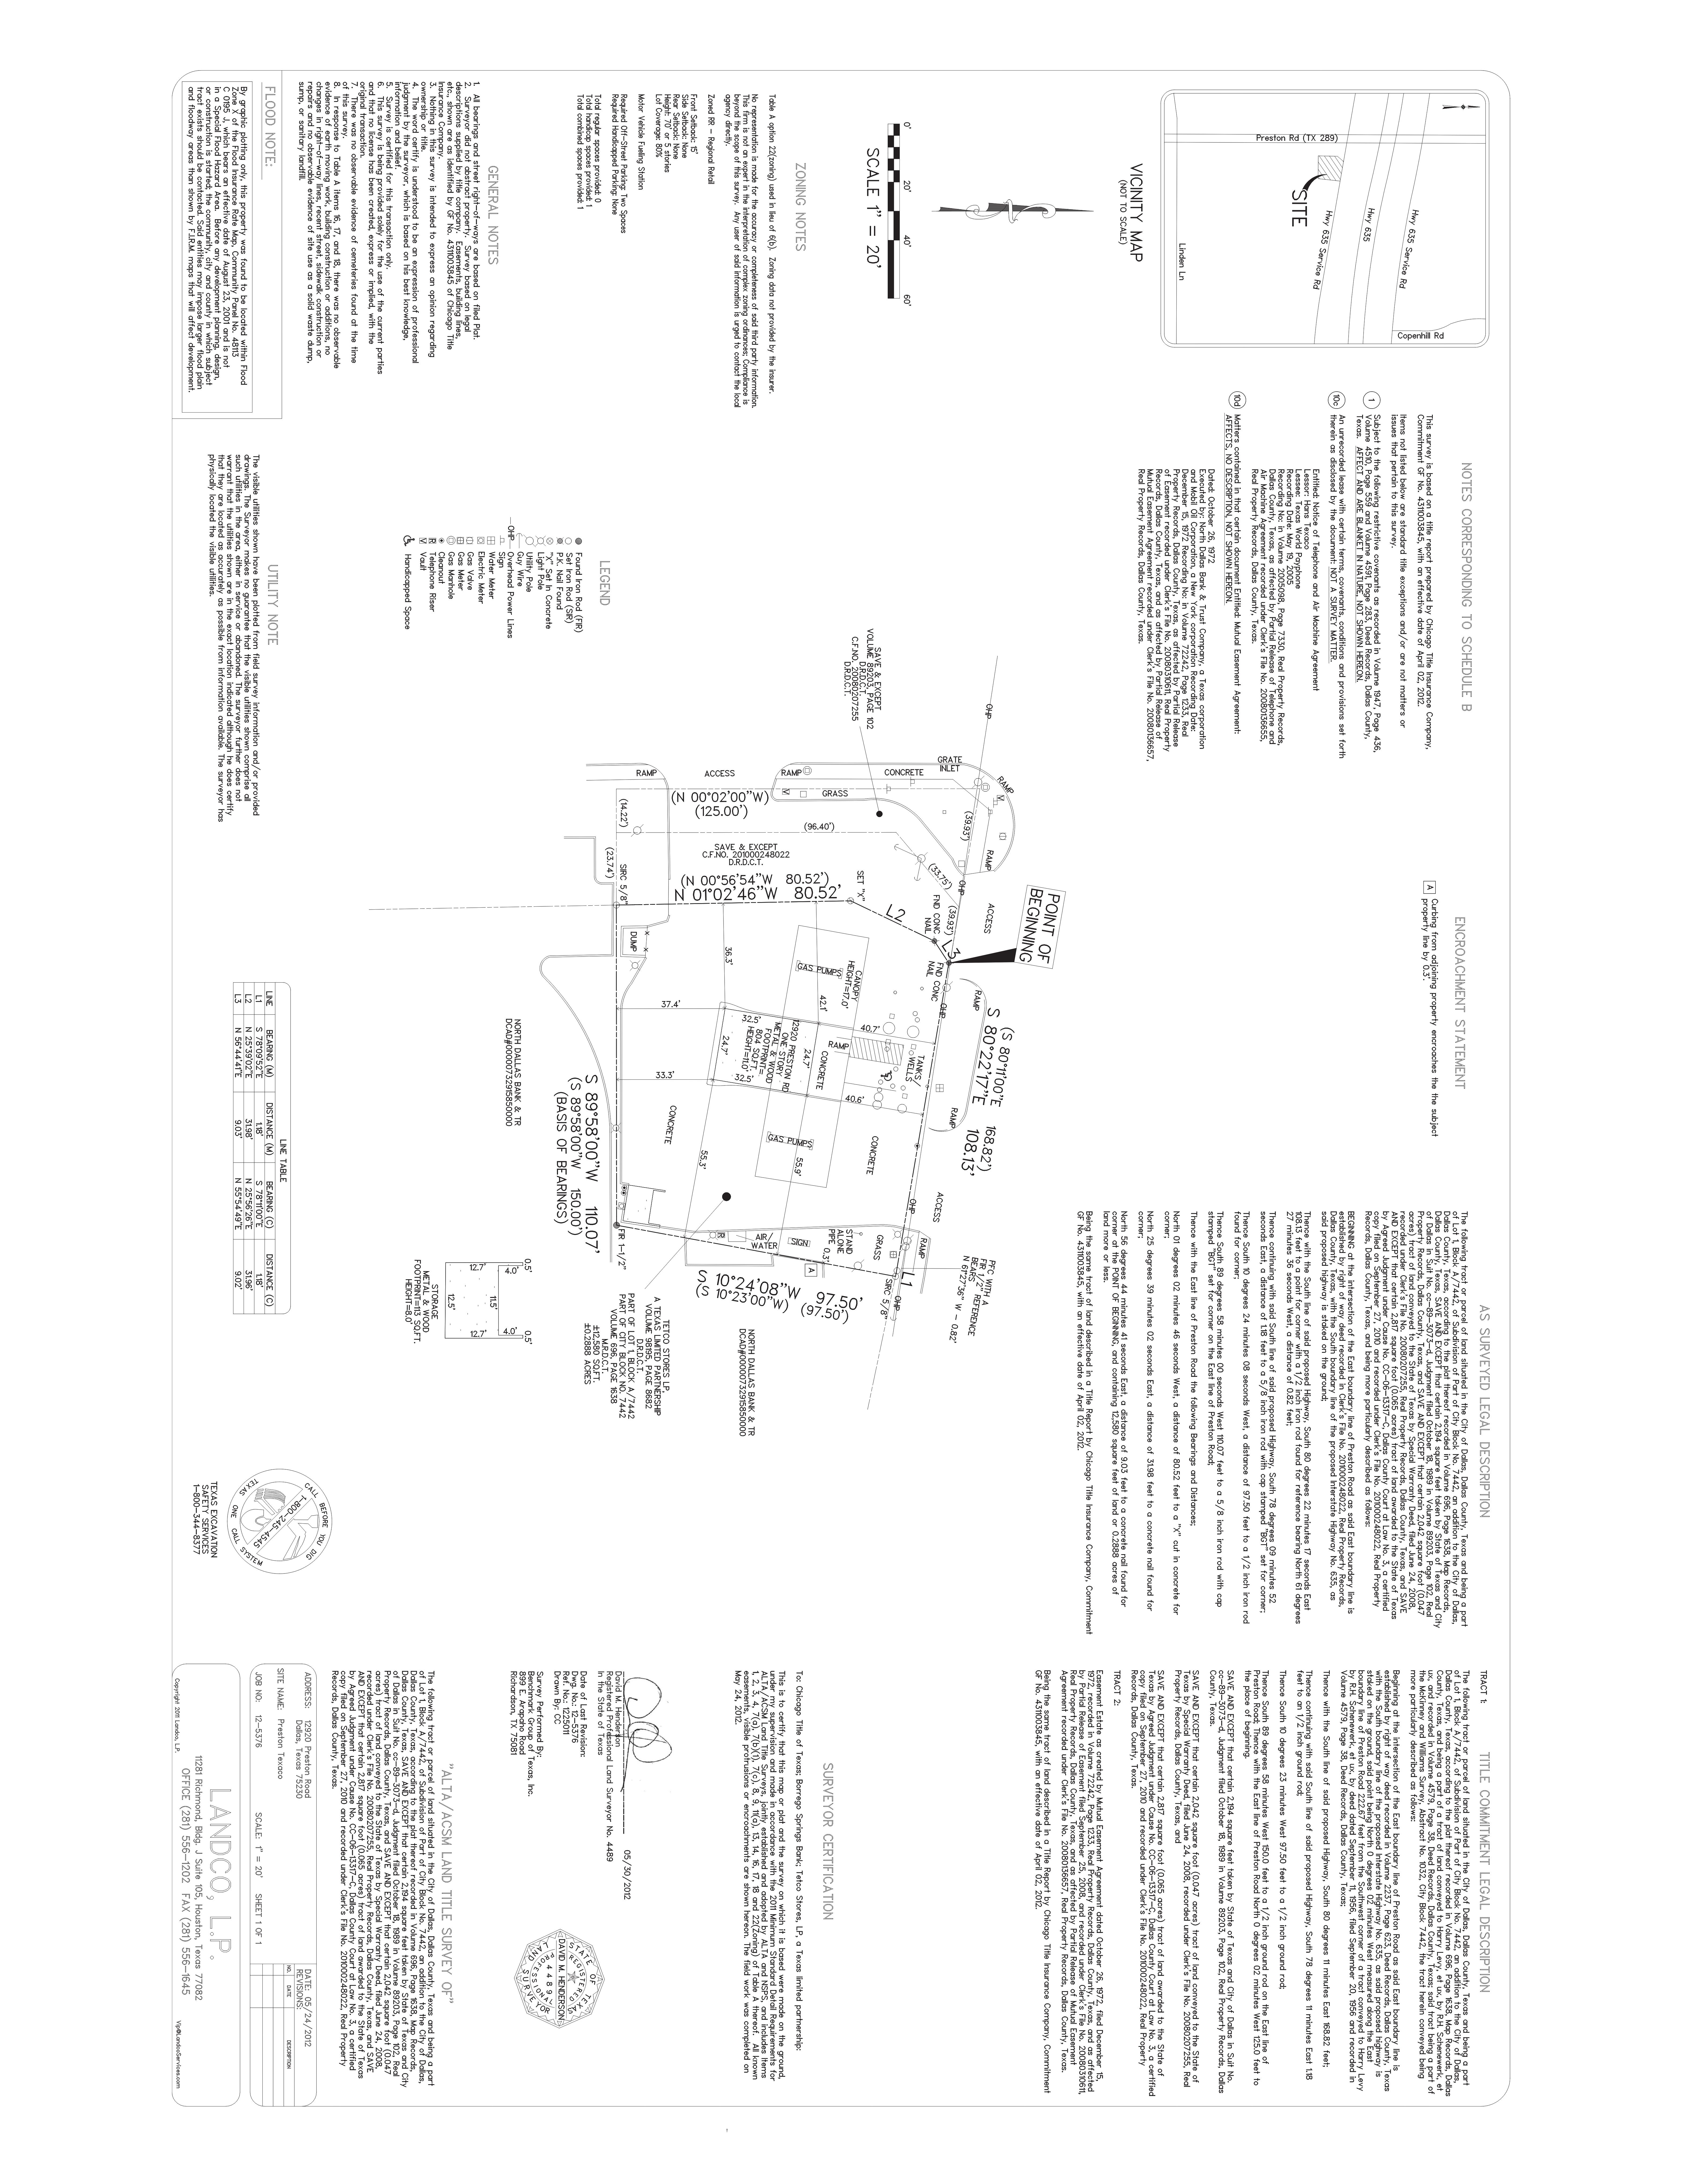 12920 Preston Road: site plan